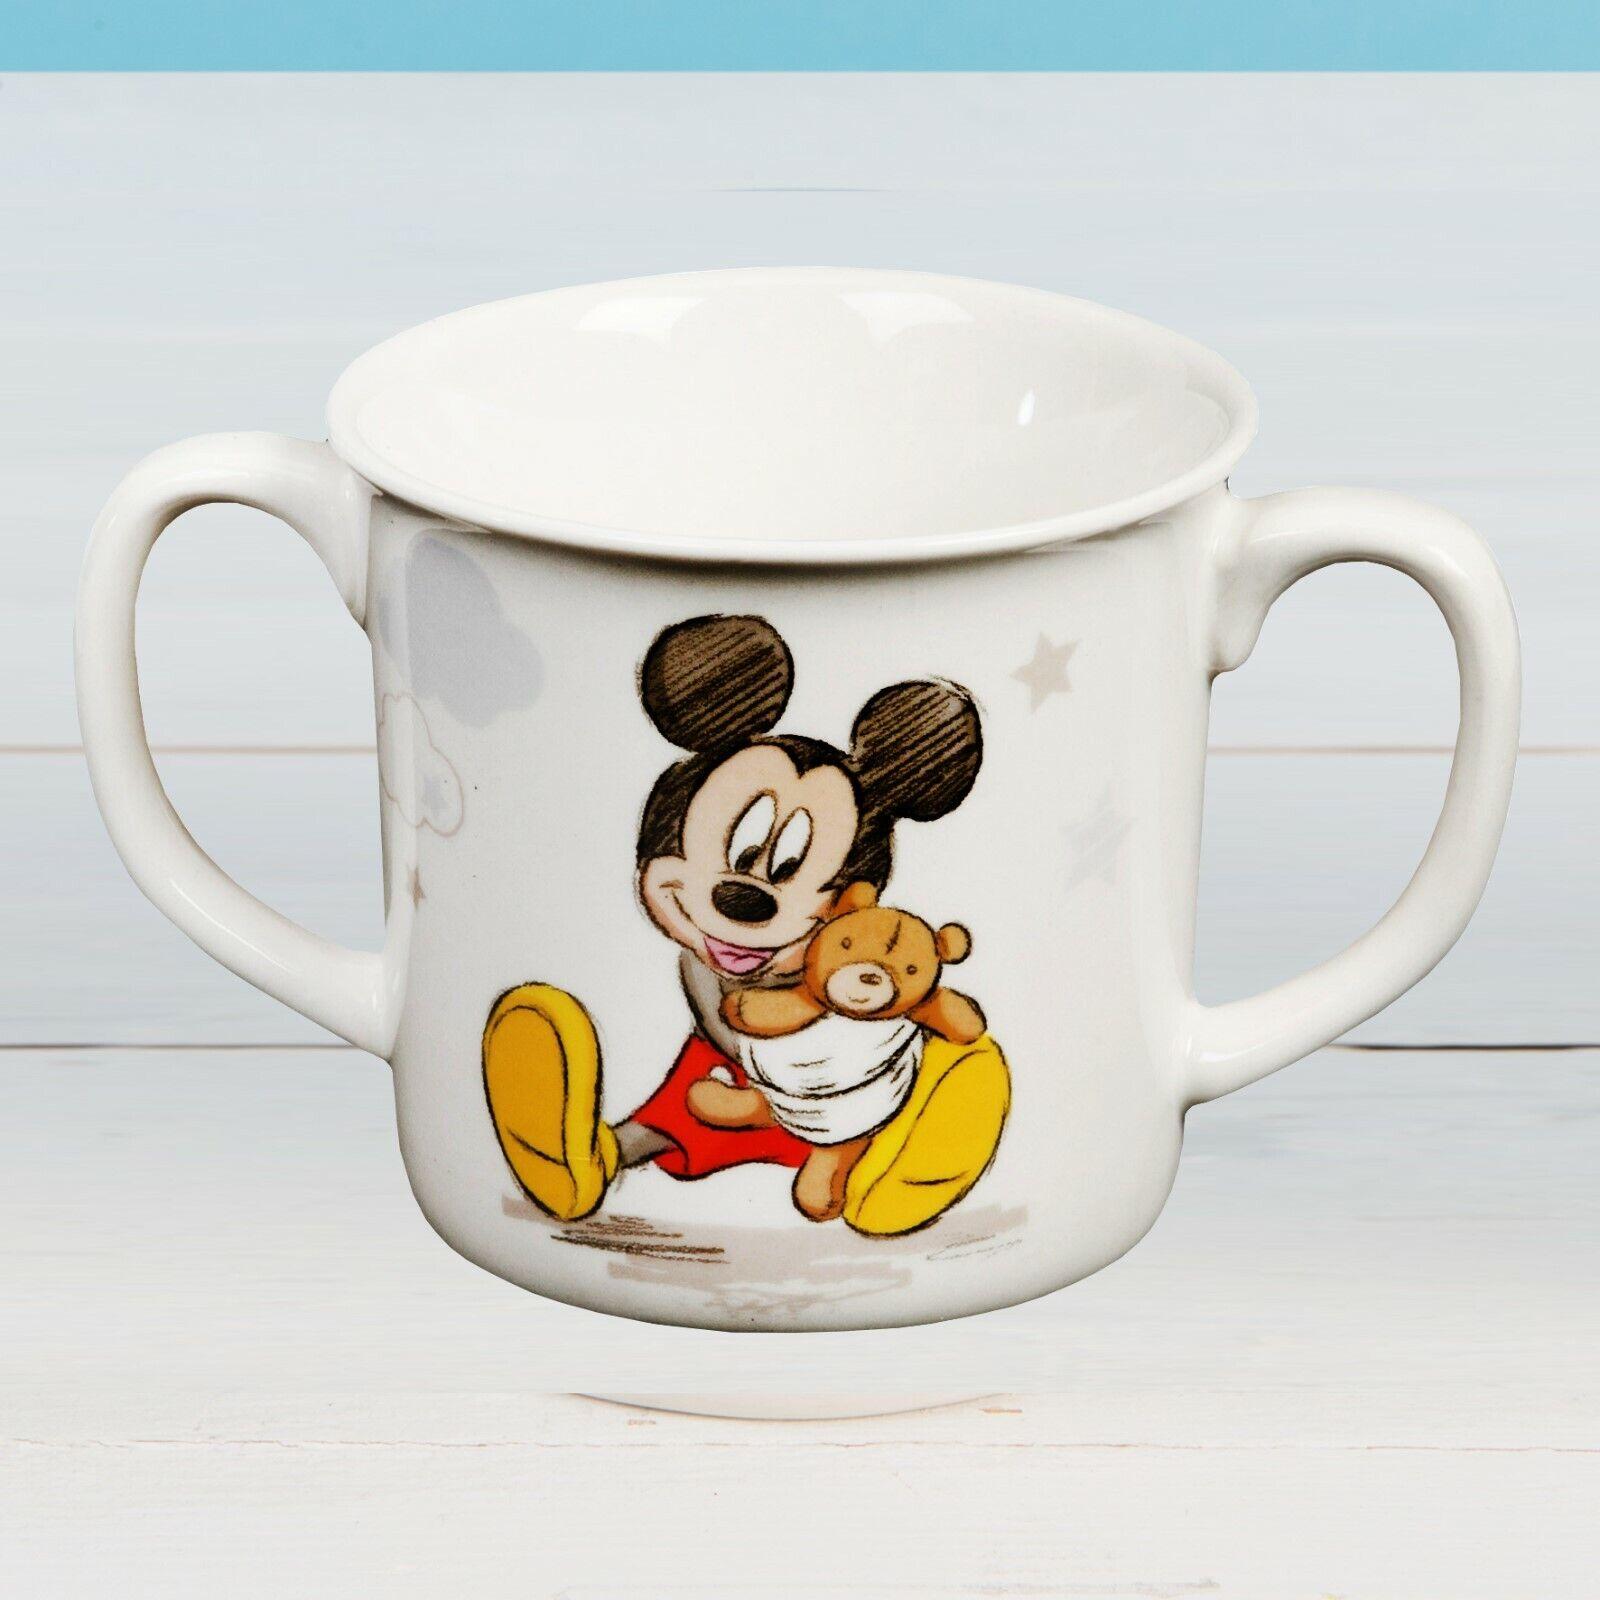 Disney Baby Magical Beginnings Ceramic Mug Mickey Mouse DI405 Christening Gift